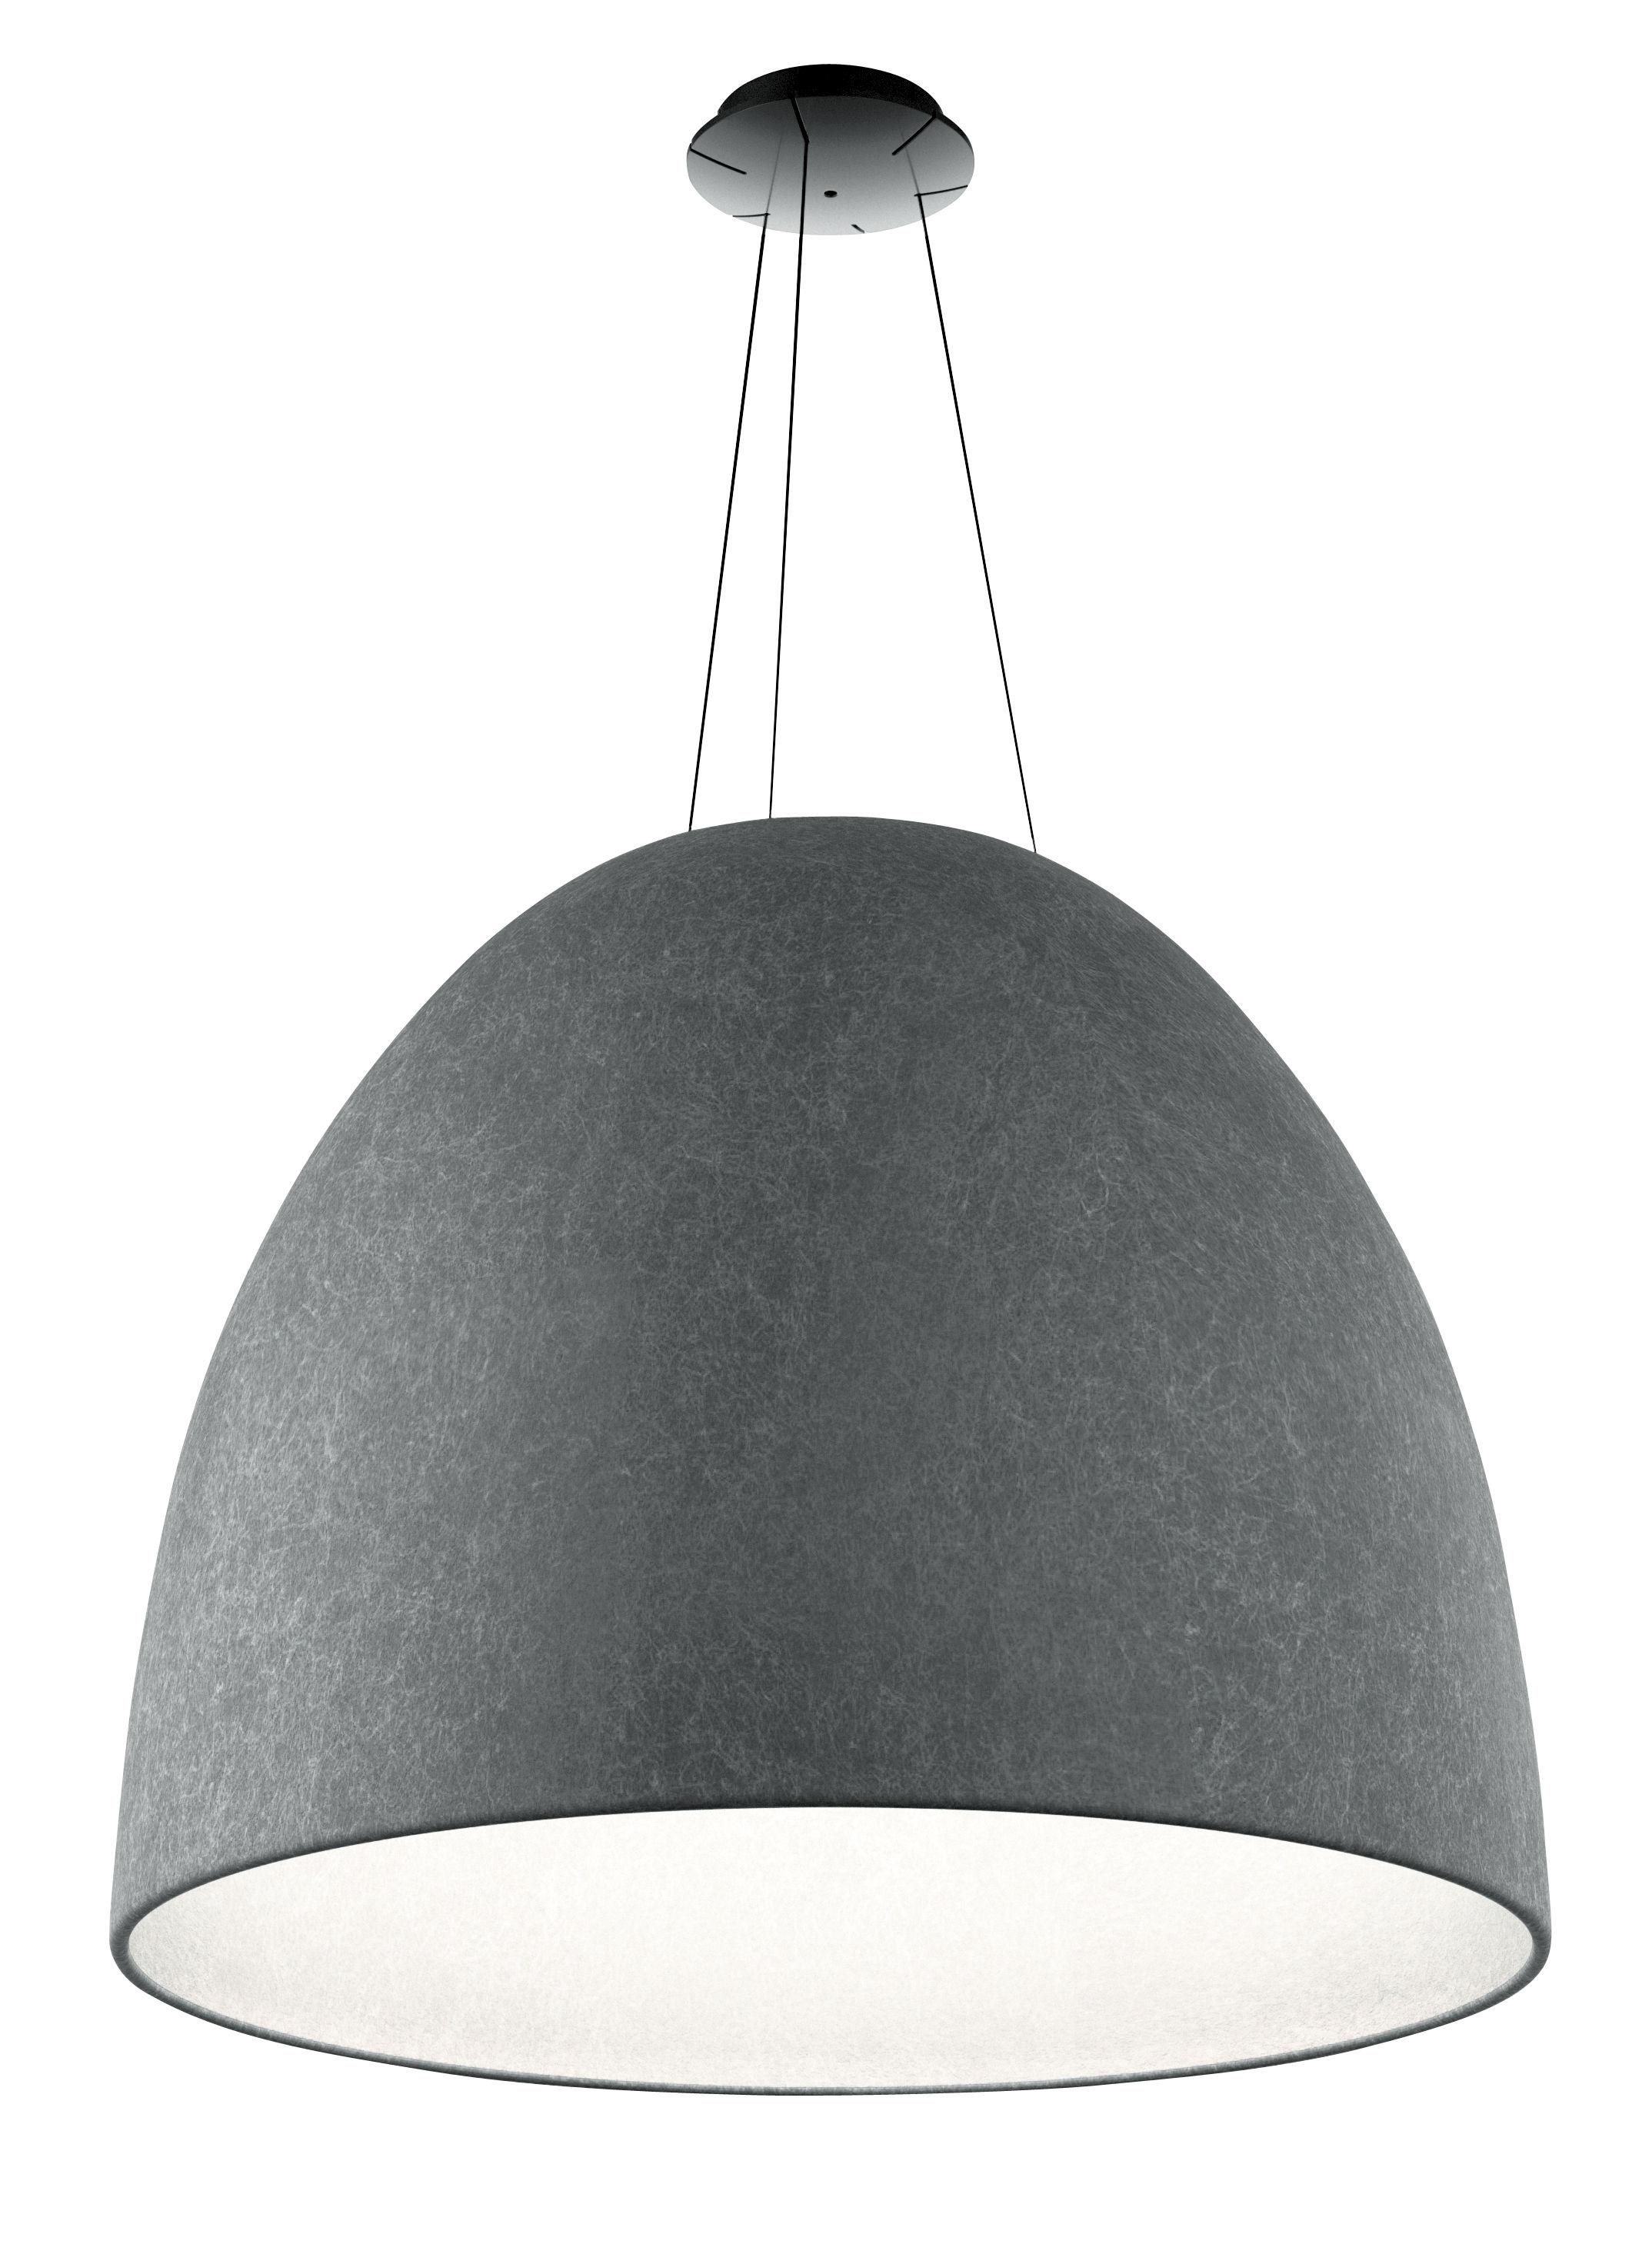 Lighting - Pendant Lighting - Nur LED Acoustic suspension - / Felt - Ø 91 cm by Artemide - Dark grey - PET felt